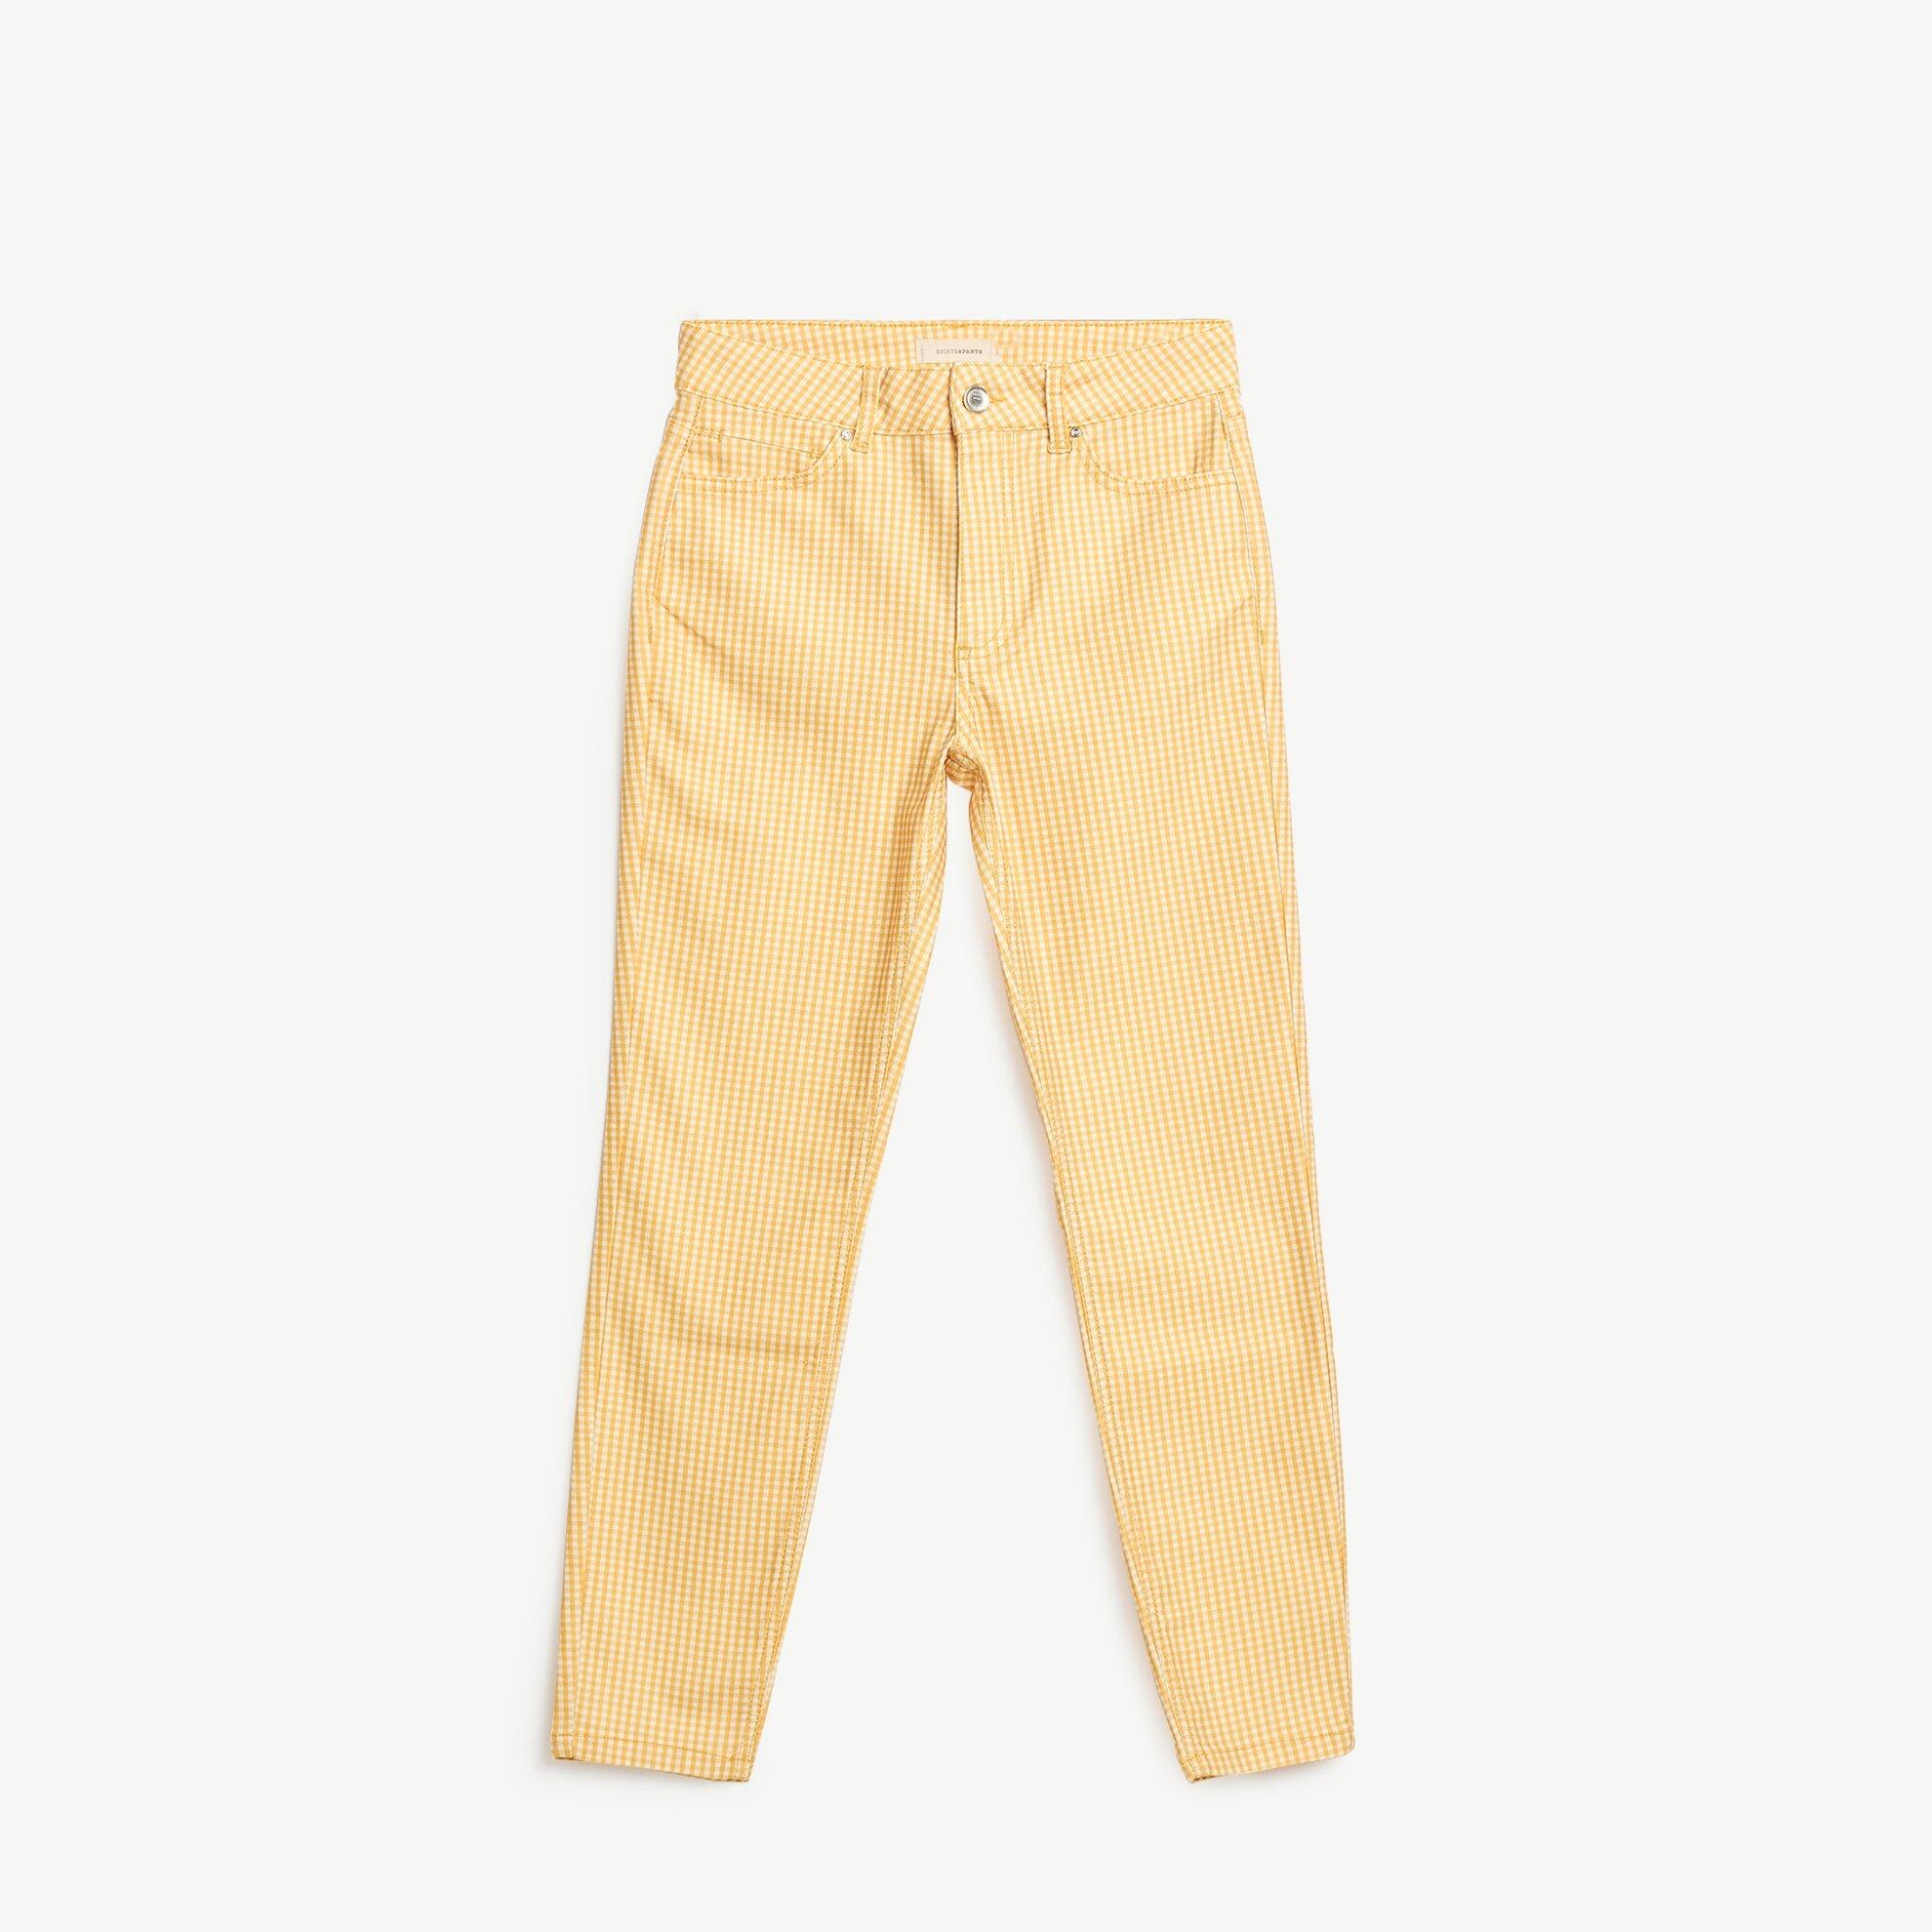 Cep Detaylı Denim Pantolon